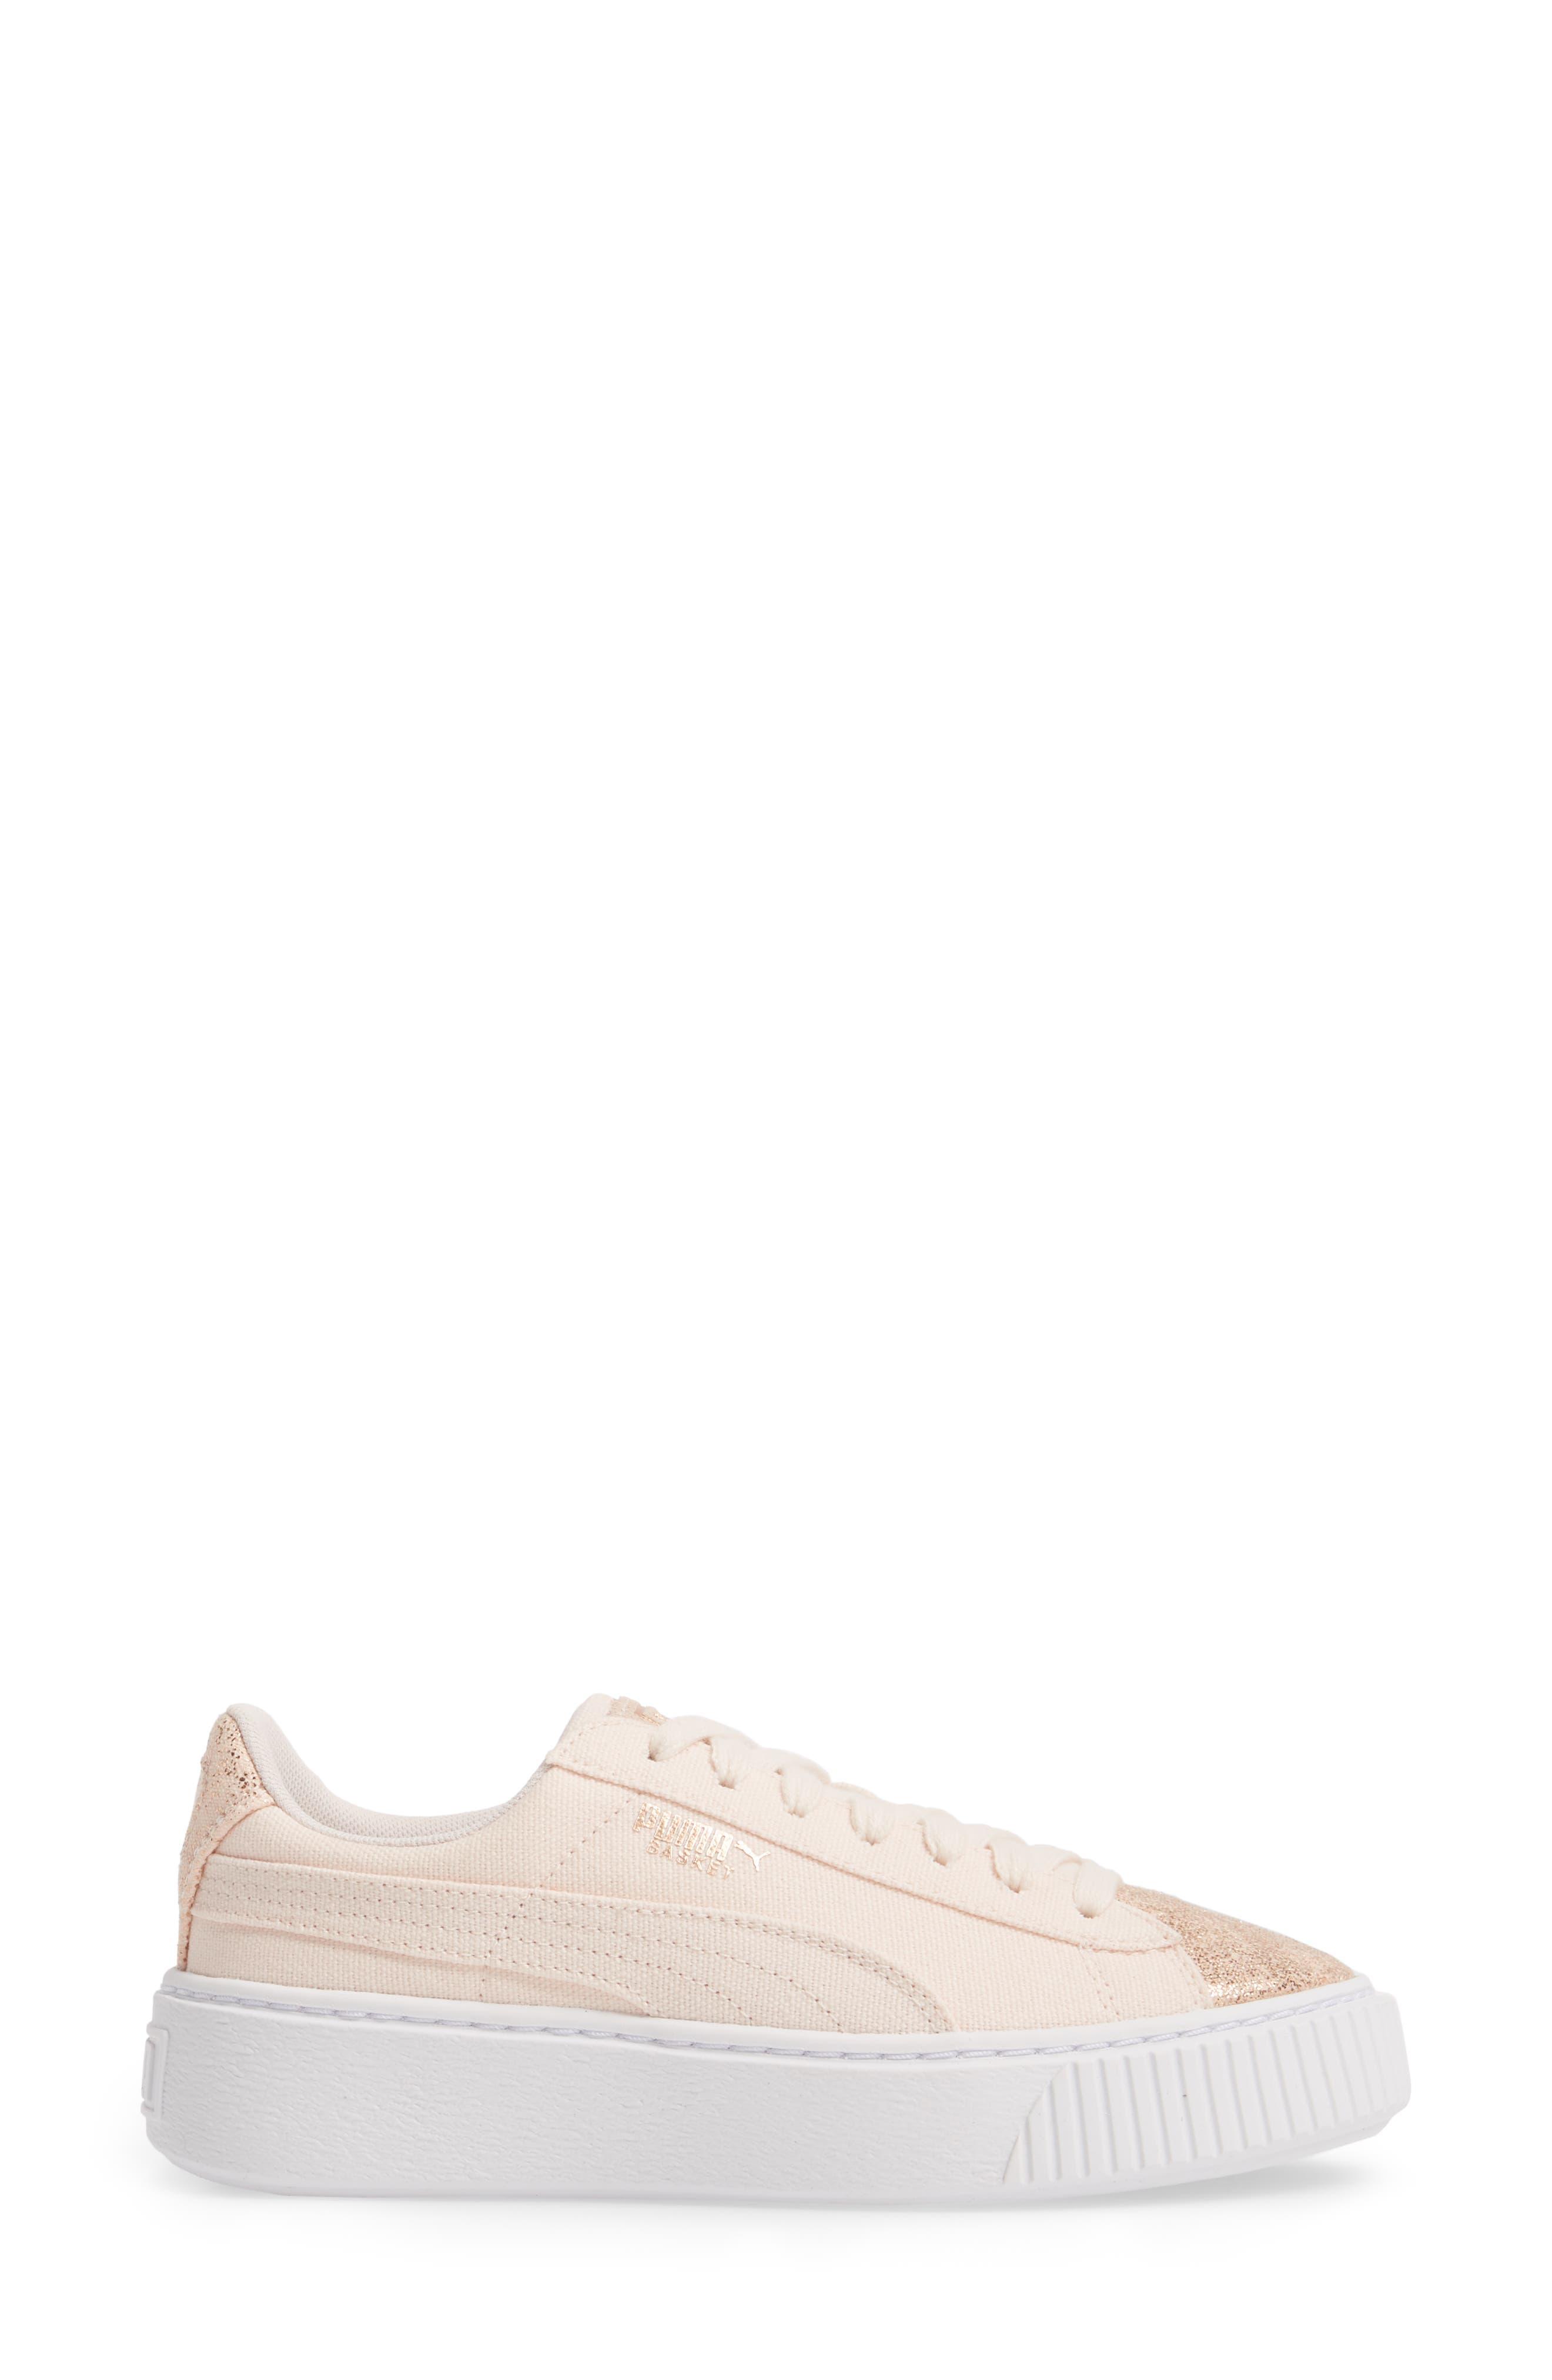 Basket Platform Sneaker,                             Alternate thumbnail 3, color,                             Pearl/ Rose Gold